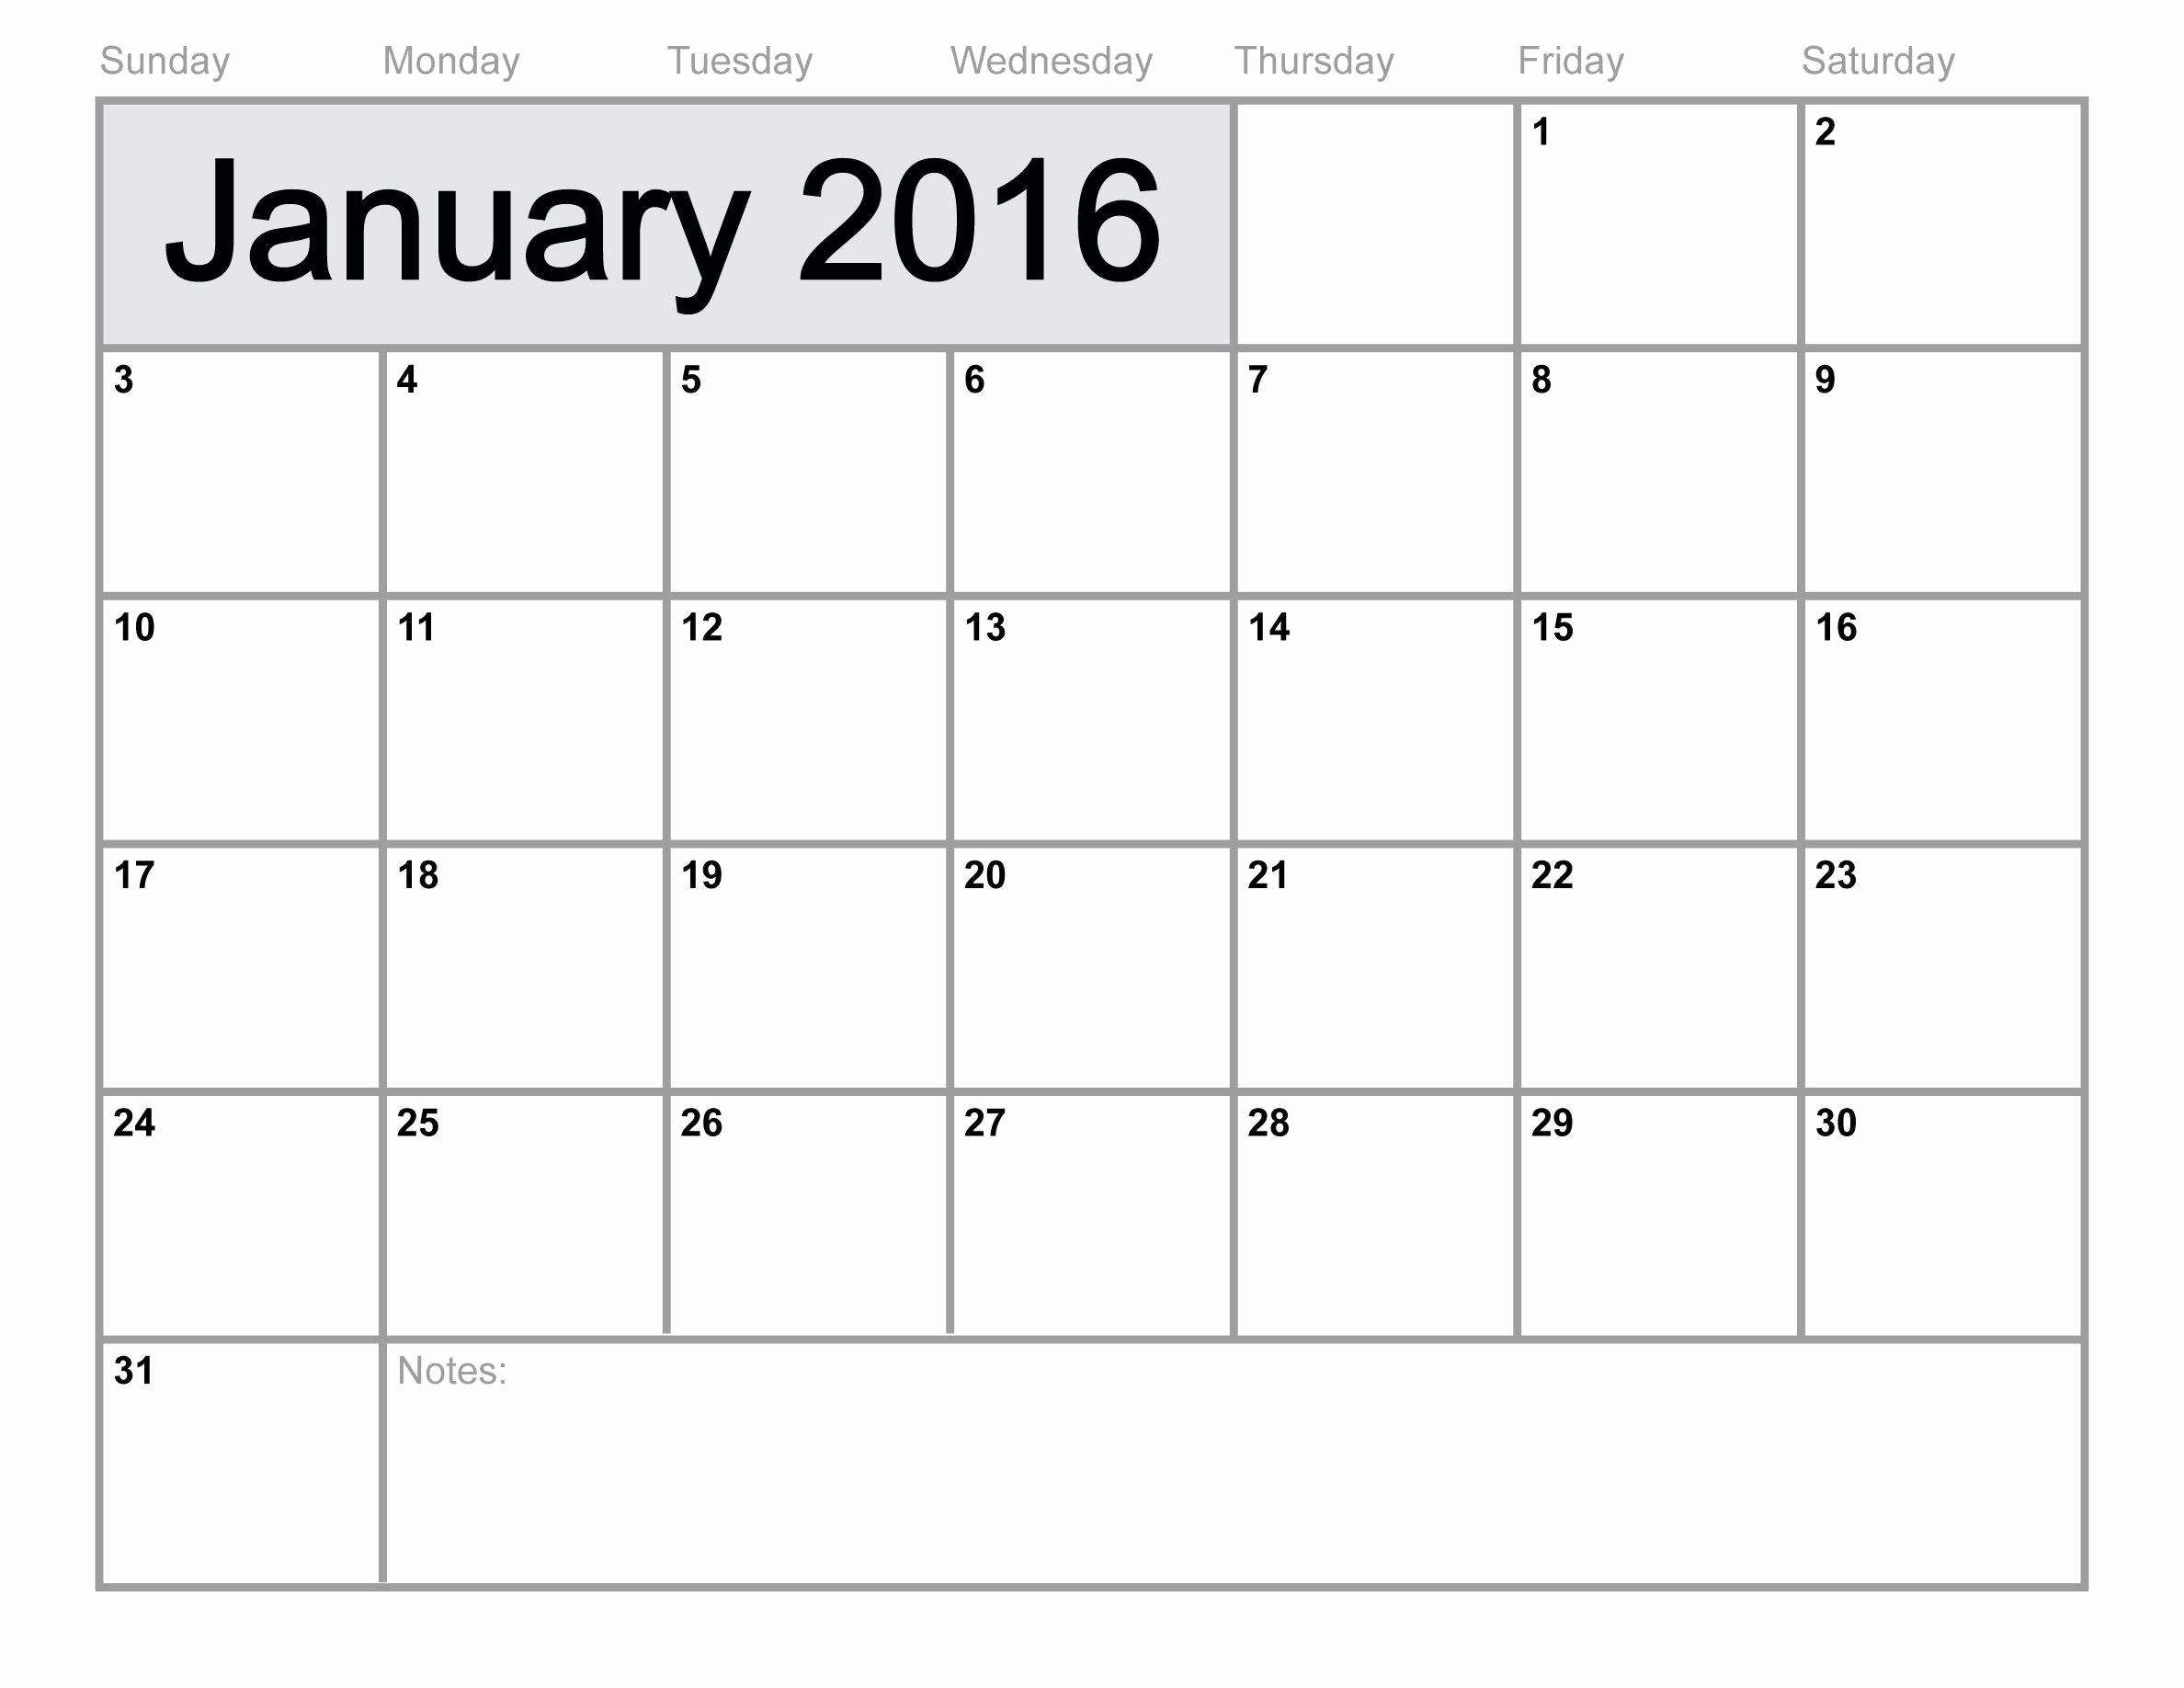 January 2016 Calendar Template Word Best Of 2019 Calendars Free Printable Best Word 2010 Calendar